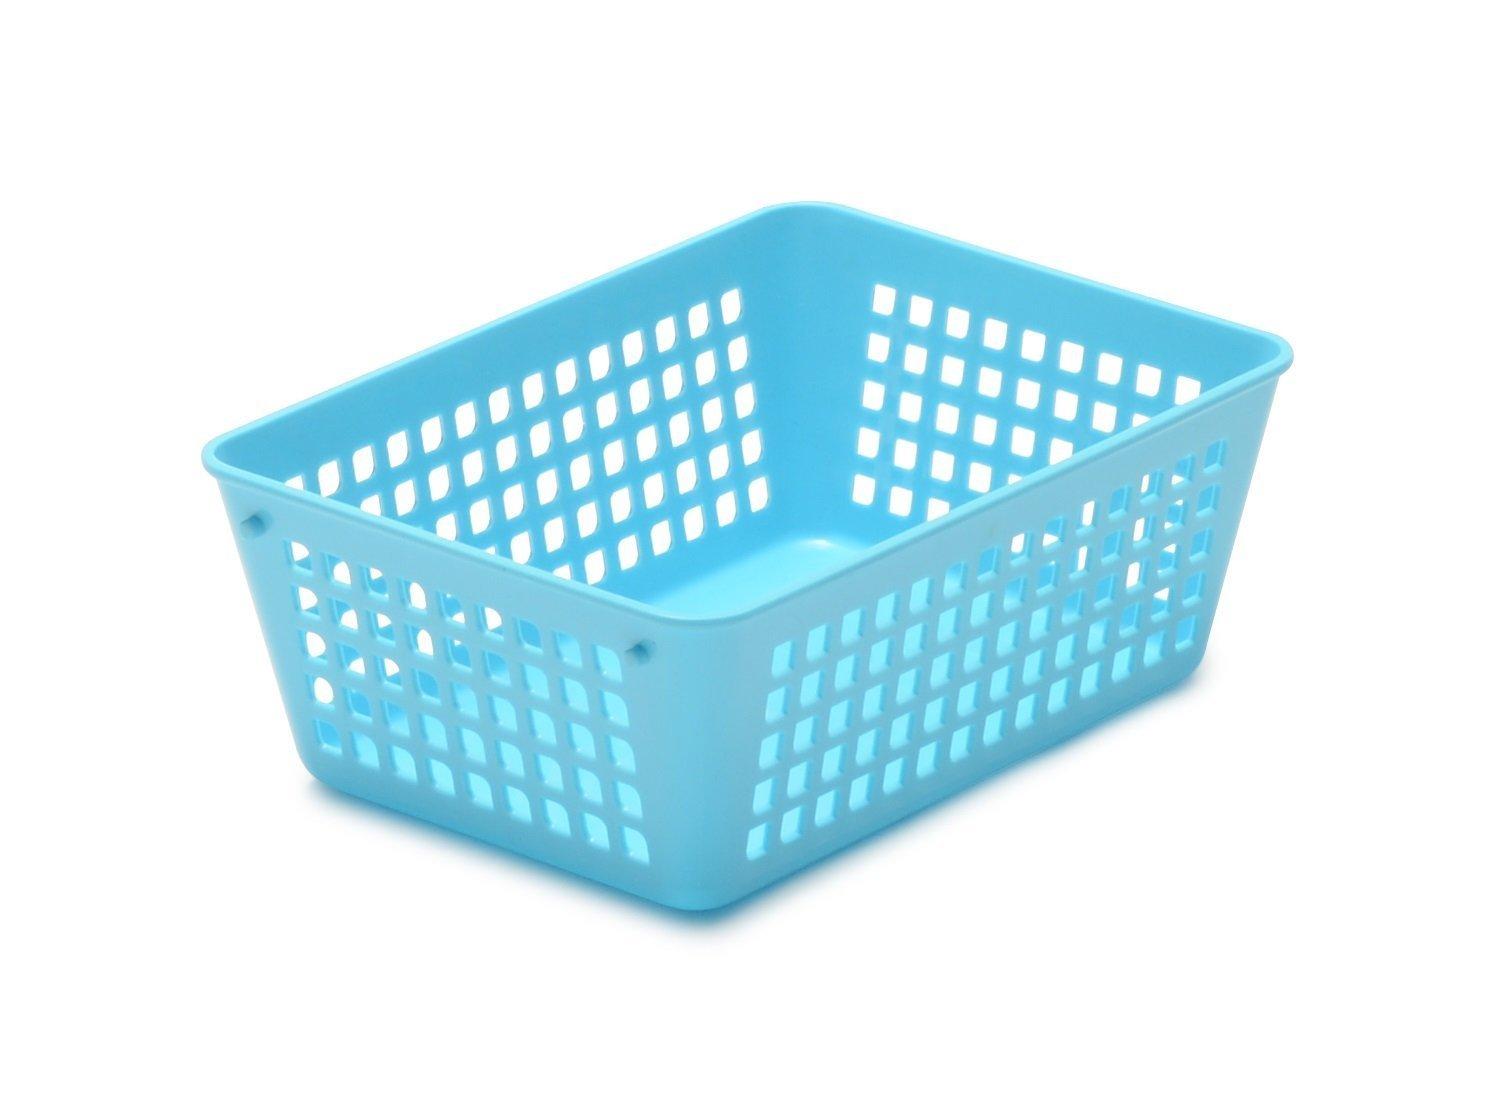 Amazon.com: Plastic Baskets Small: Home & Kitchen